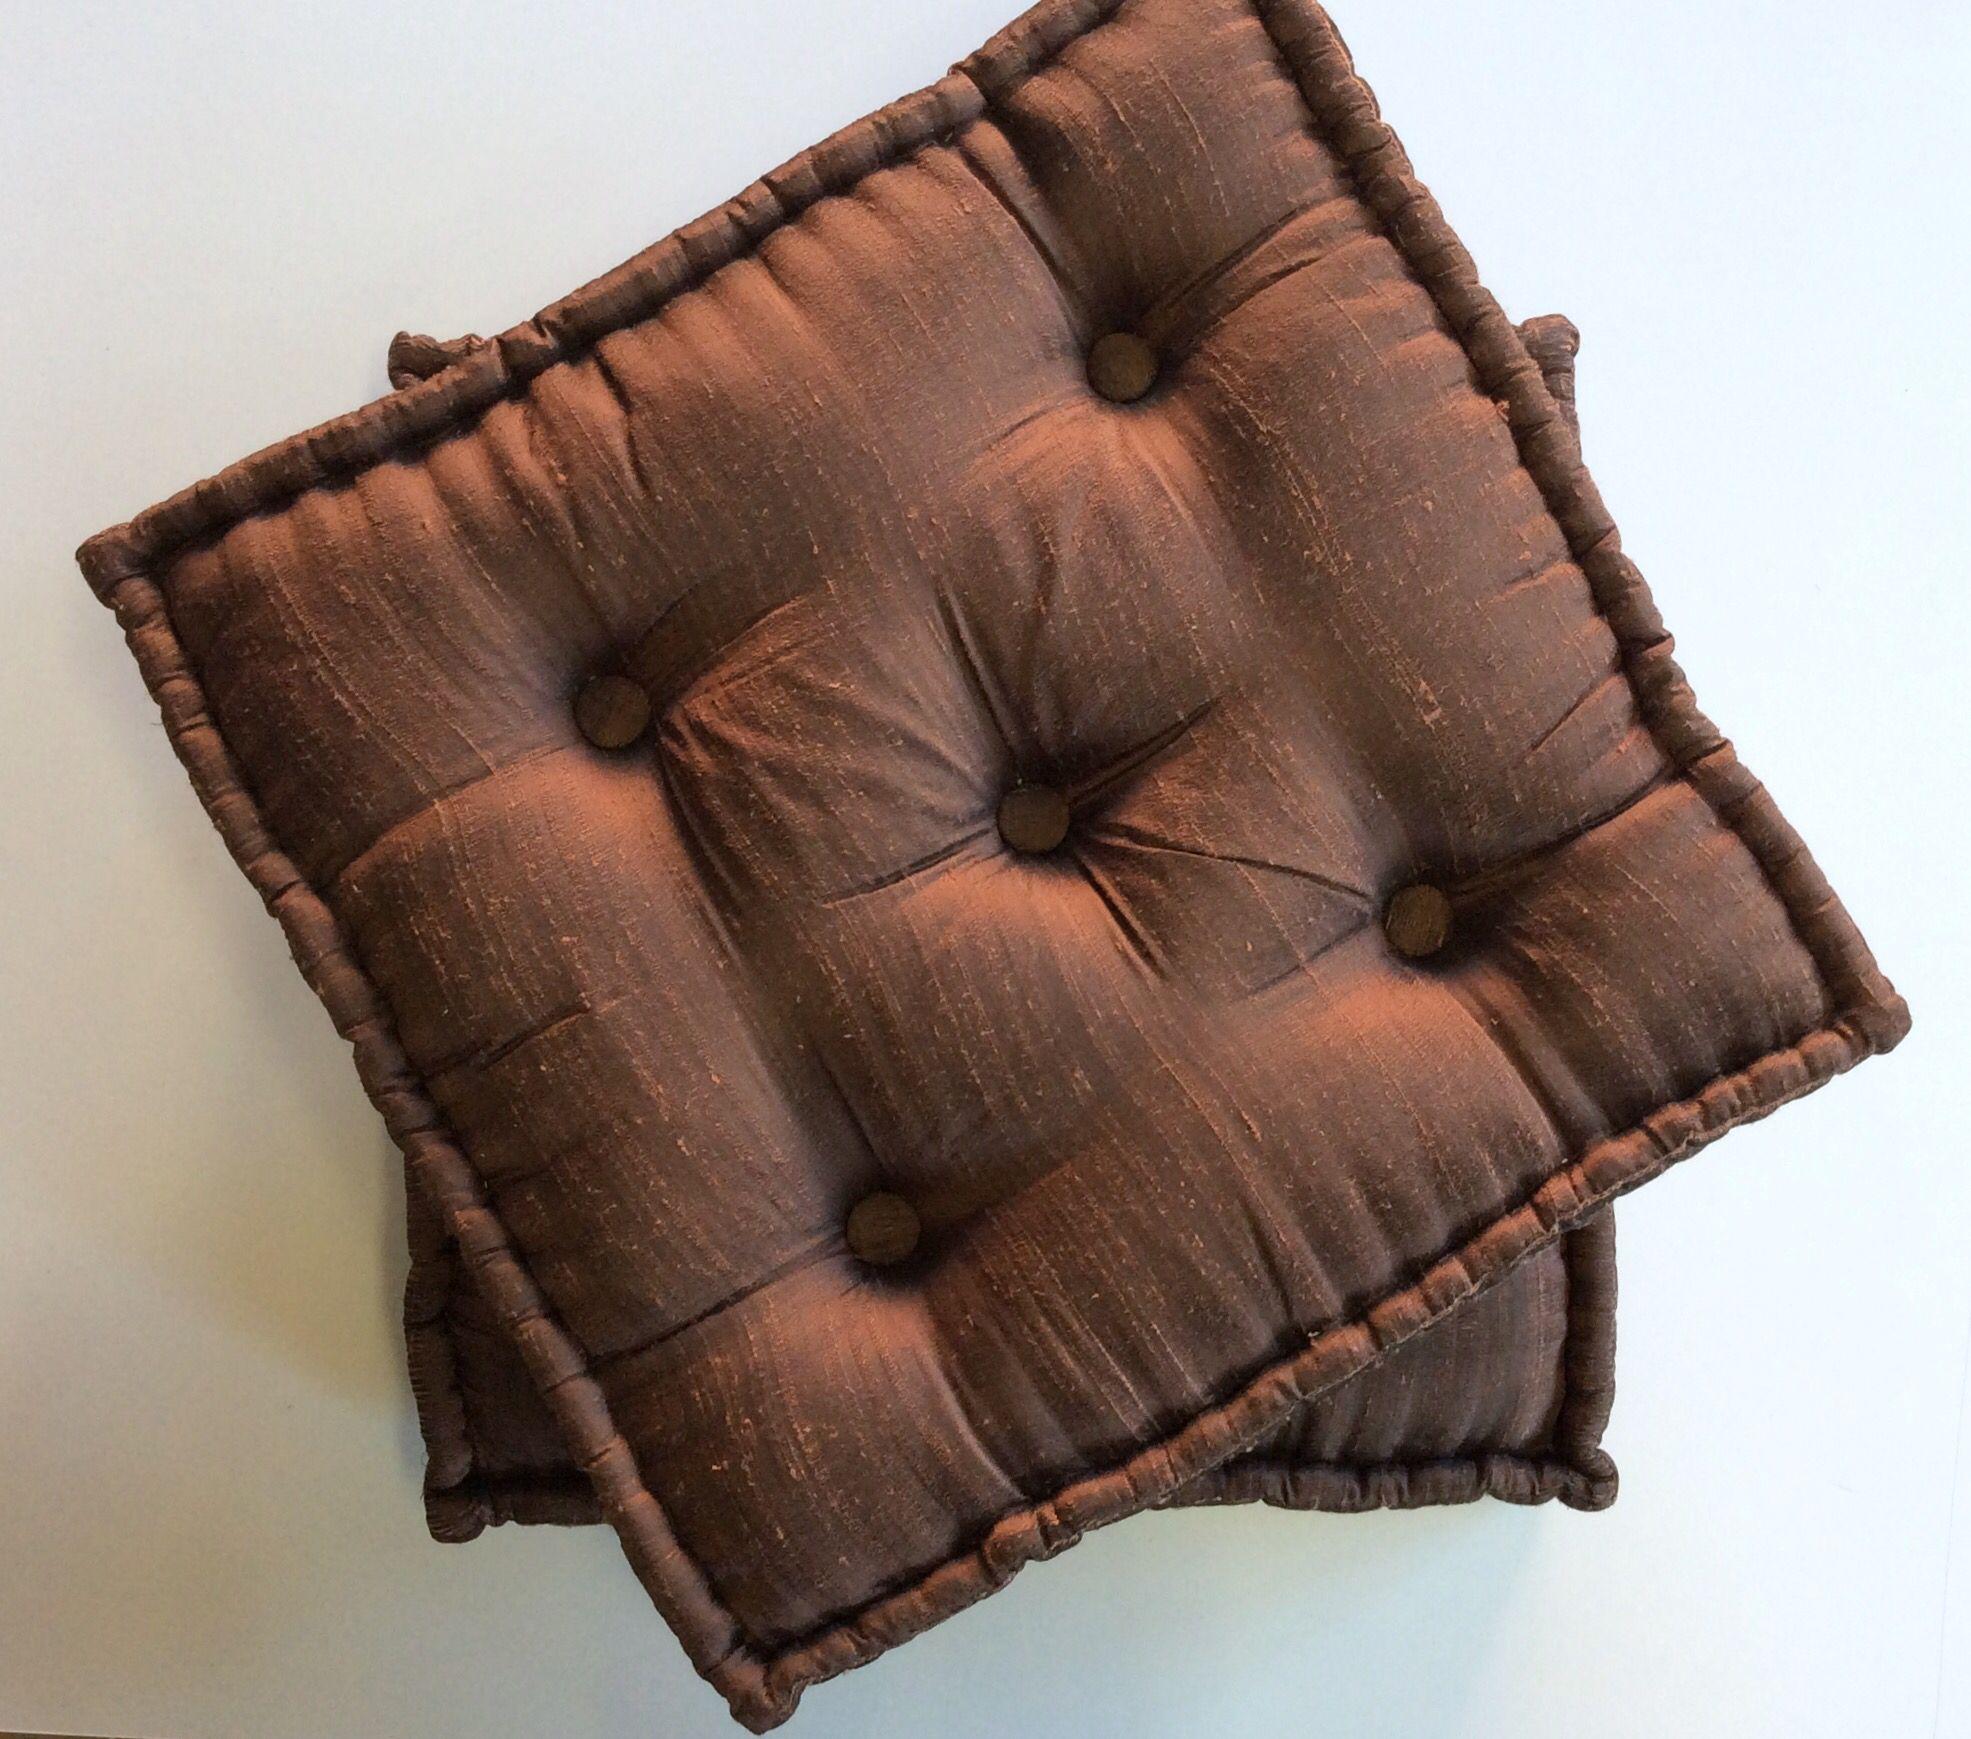 Cuscino Capitonnè Fai Da Te n.04 cuscini in raso colore marrone con capitonne. cm